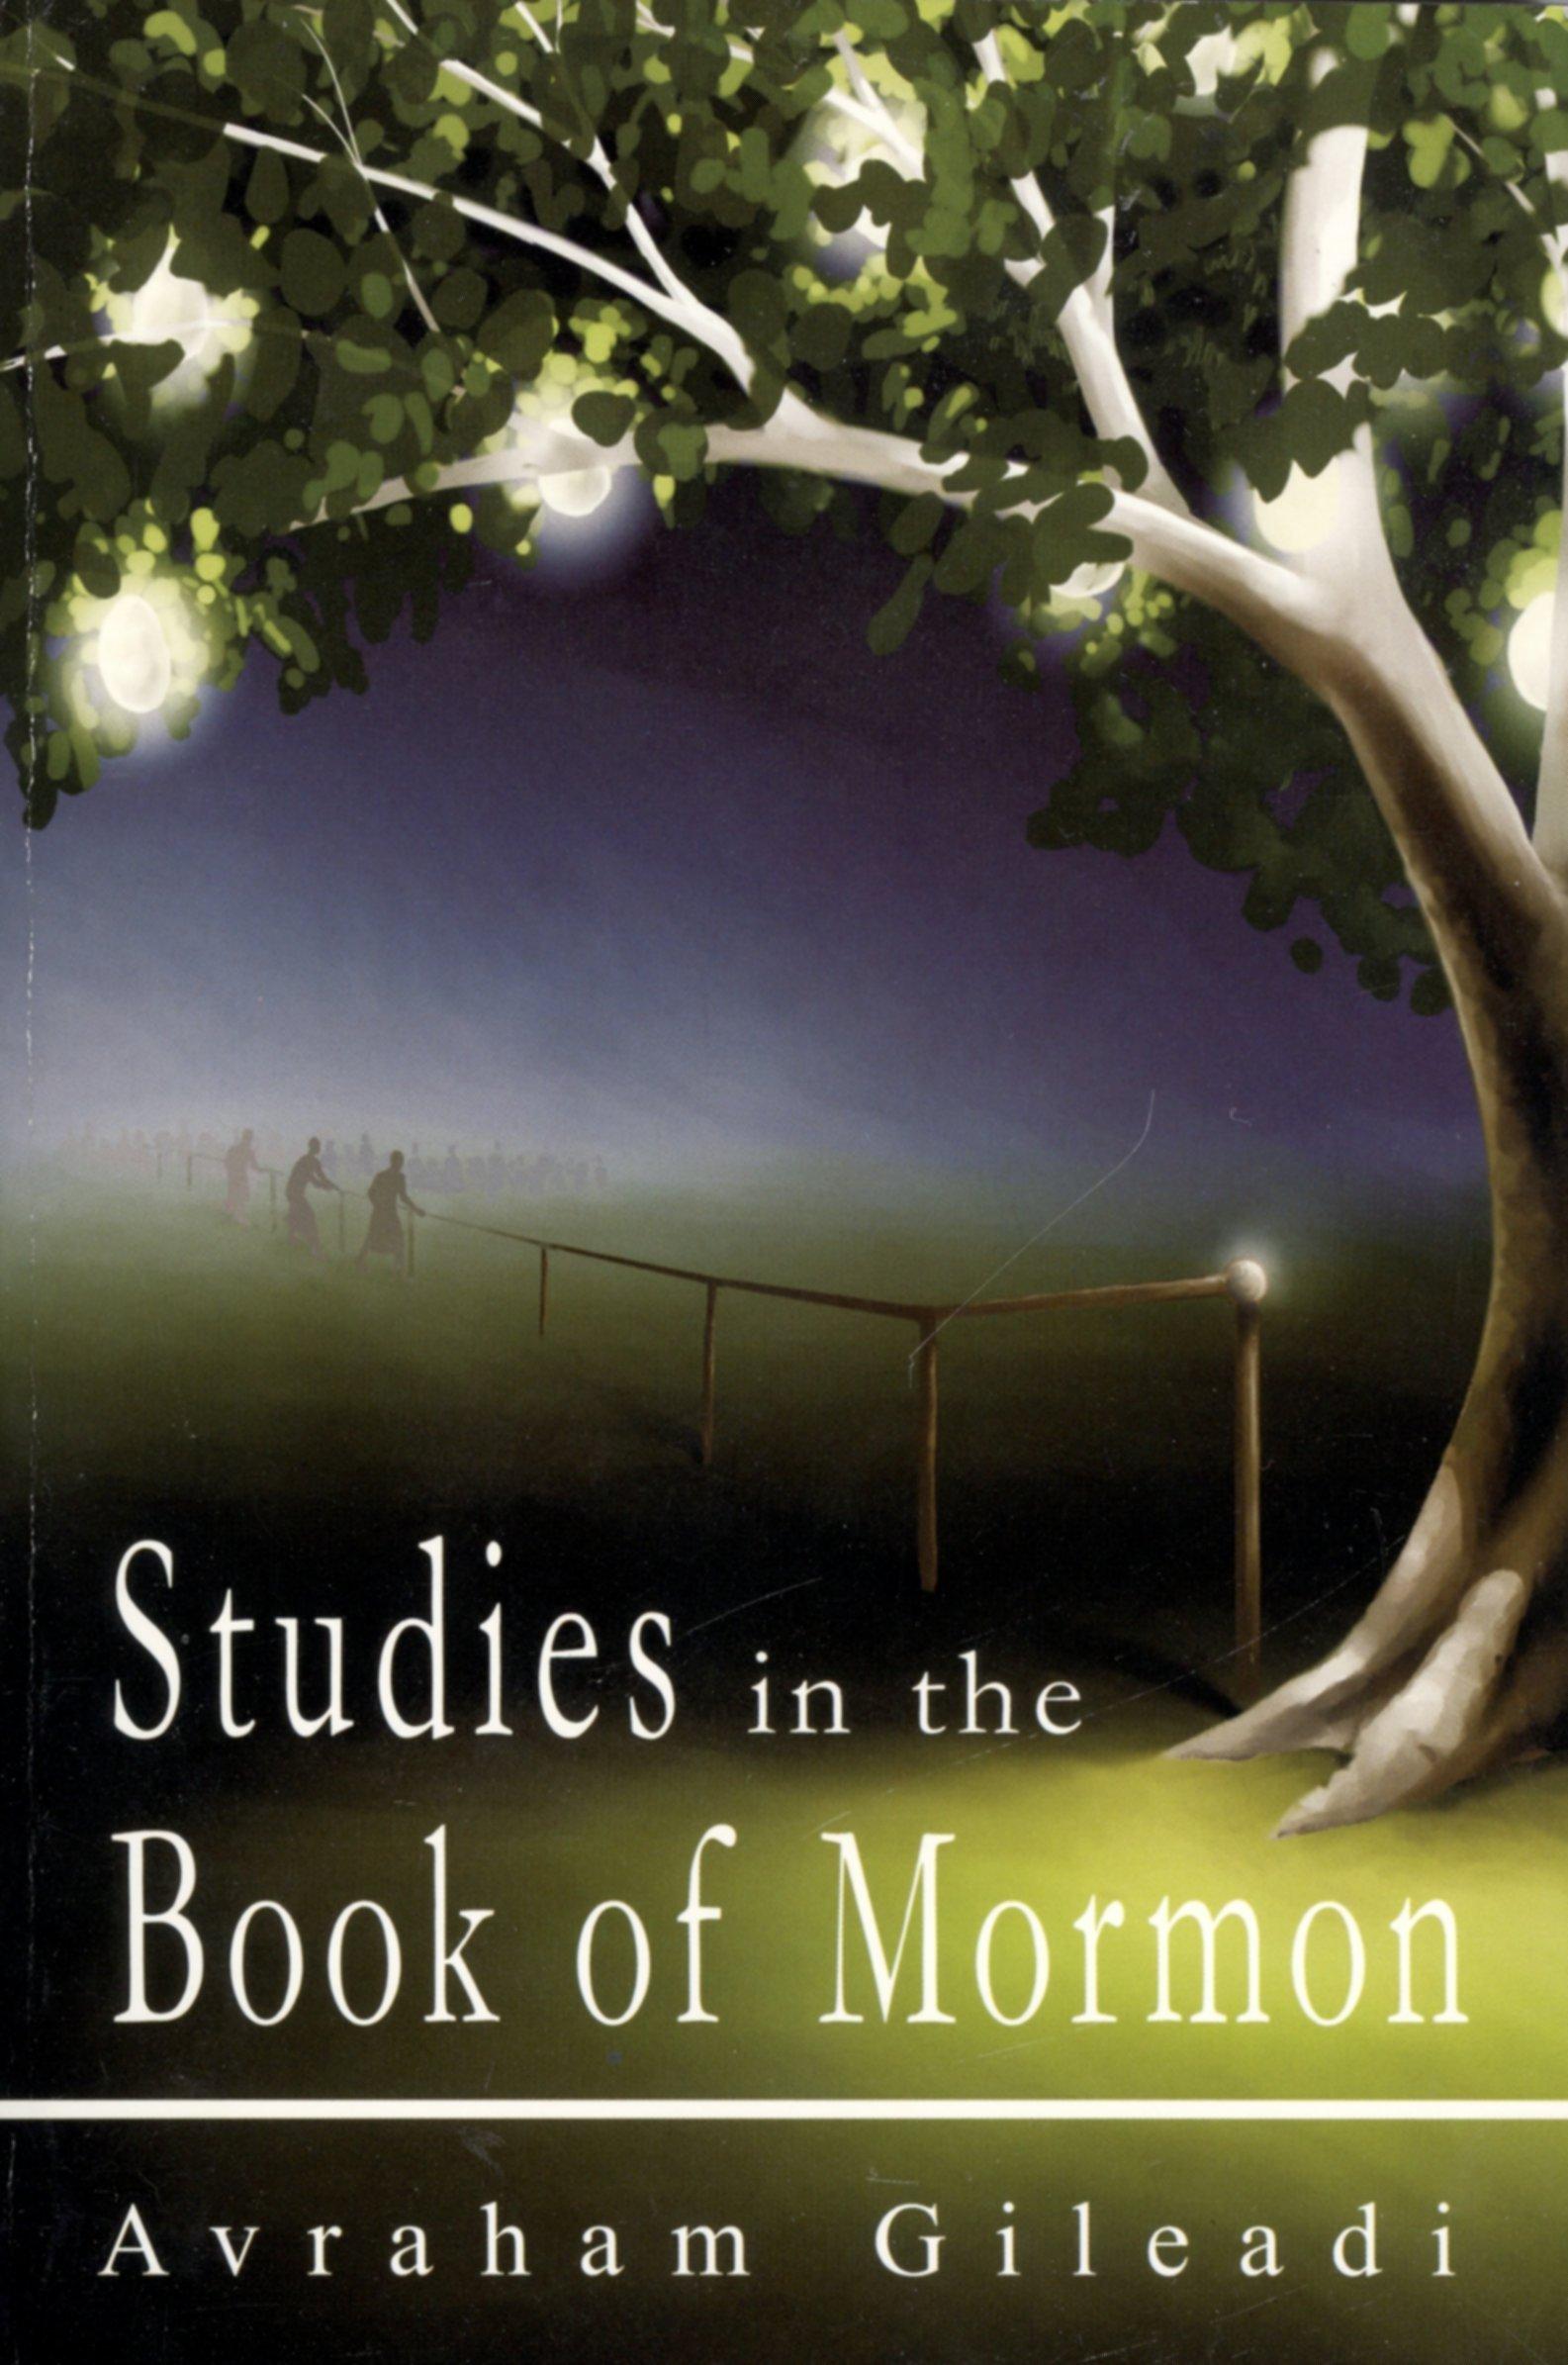 Studies in the Book of Mormon 2.jpg